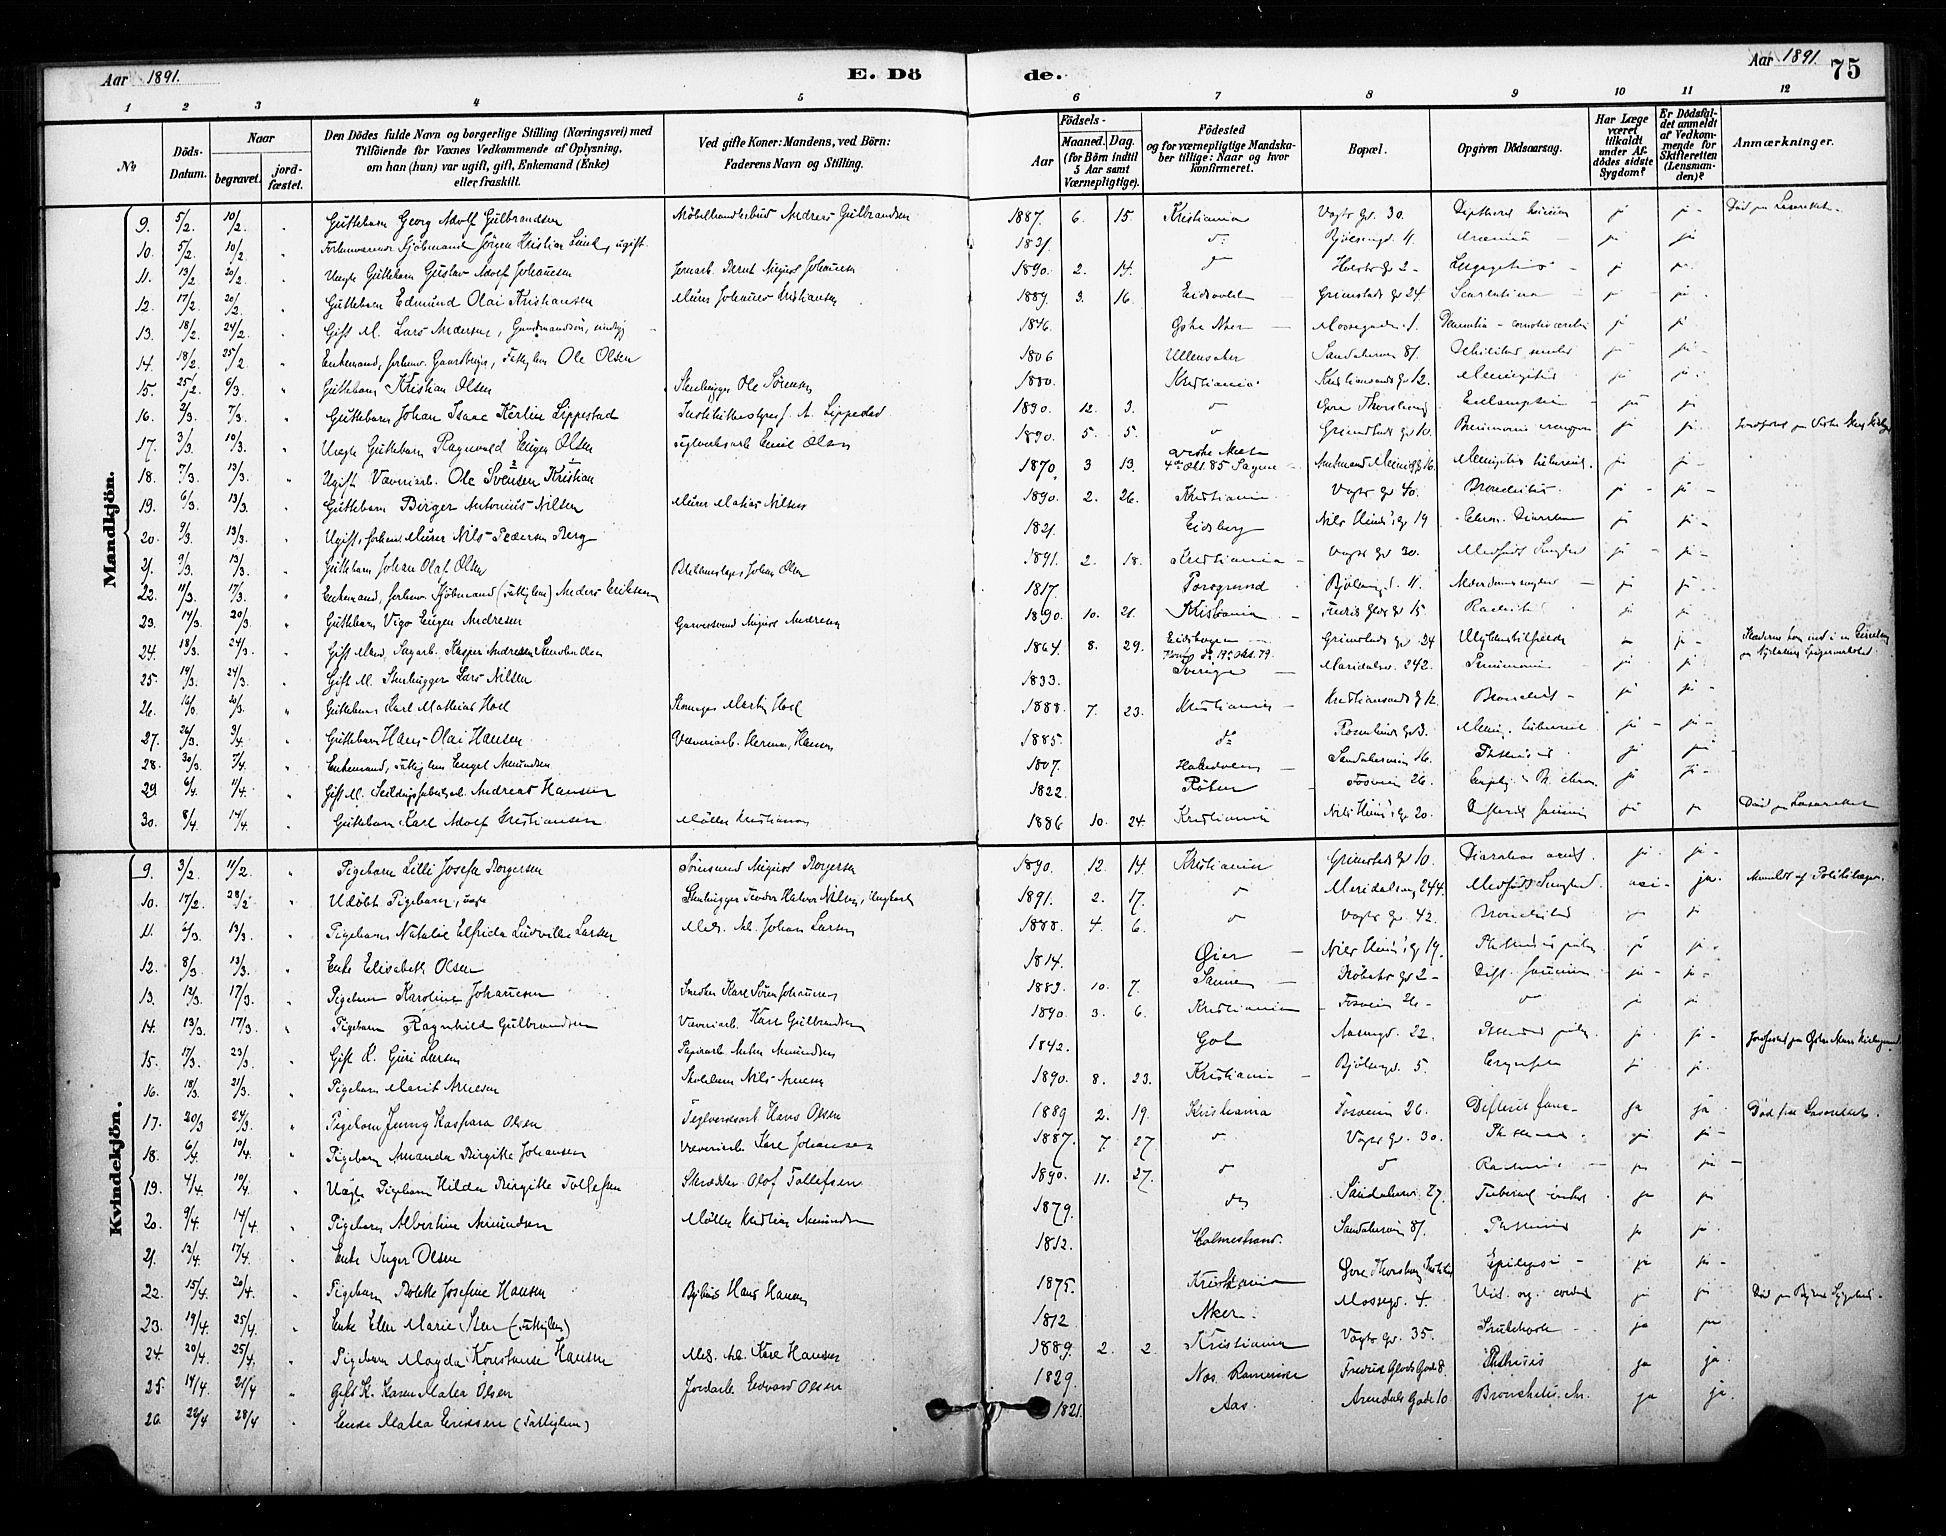 SAO, Sagene prestekontor Kirkebøker, F/L0003: Ministerialbok nr. 3, 1880-1922, s. 75